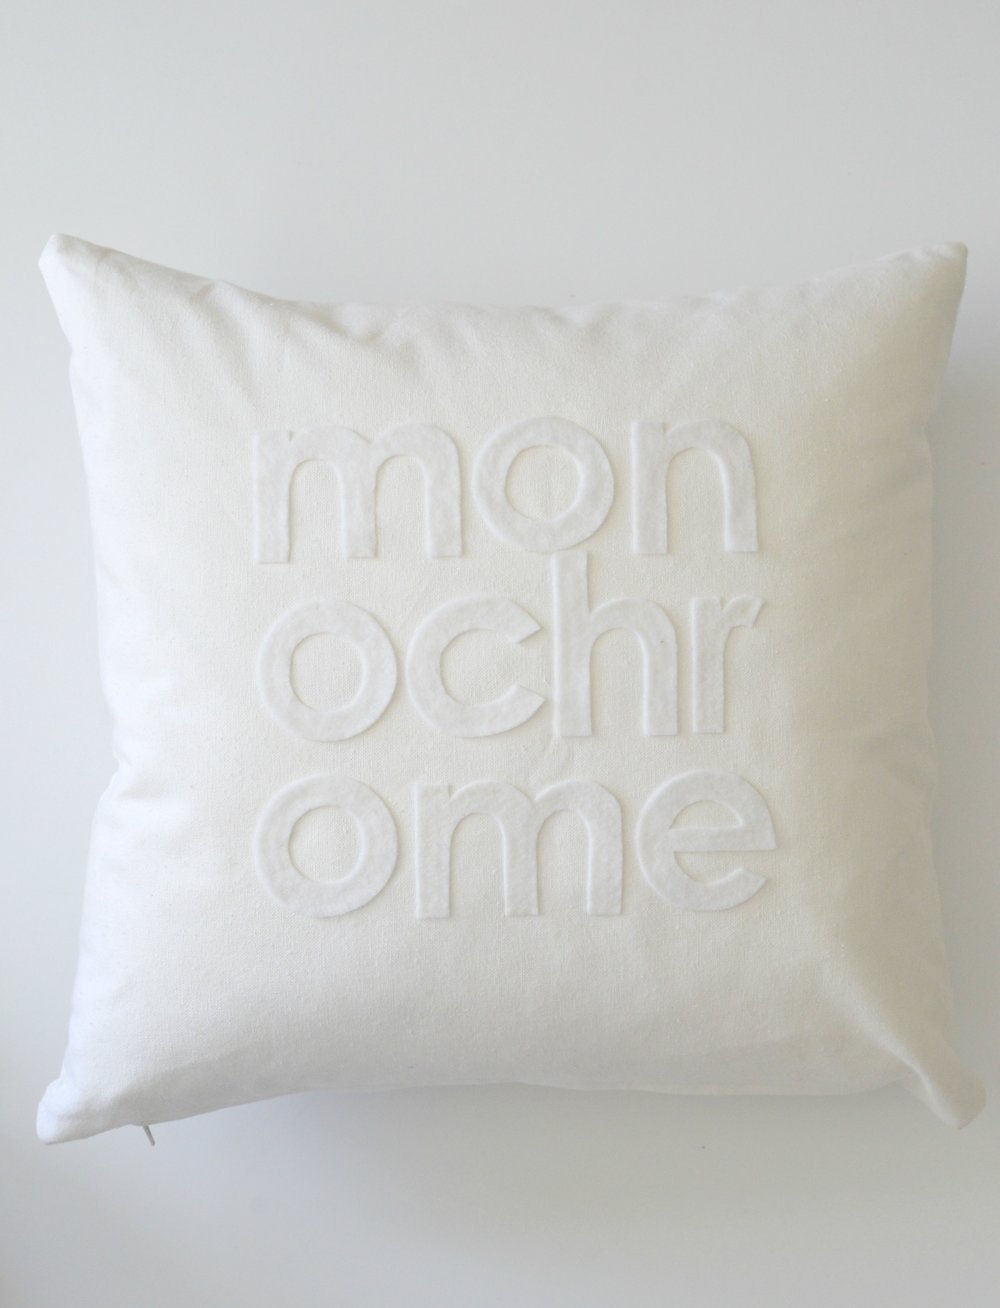 monochrome7.jpg